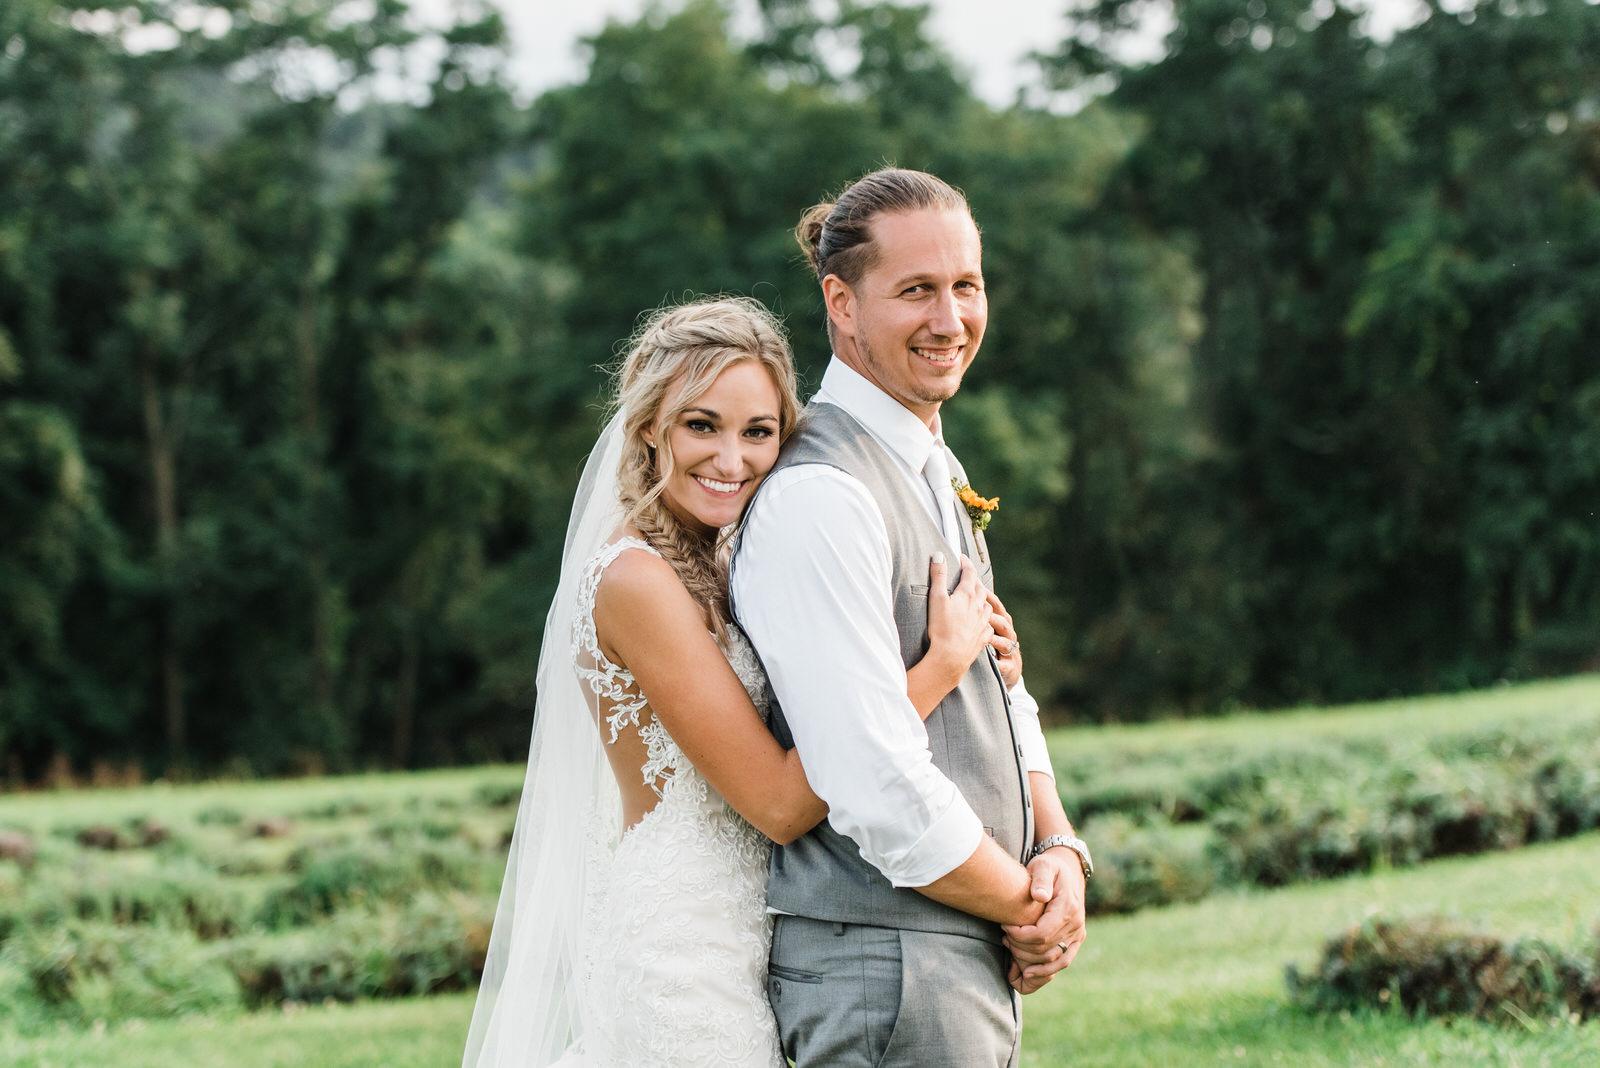 destiny-hill-farm-wedding-photos-pittsburgh-wedding-photographers-55.jpg